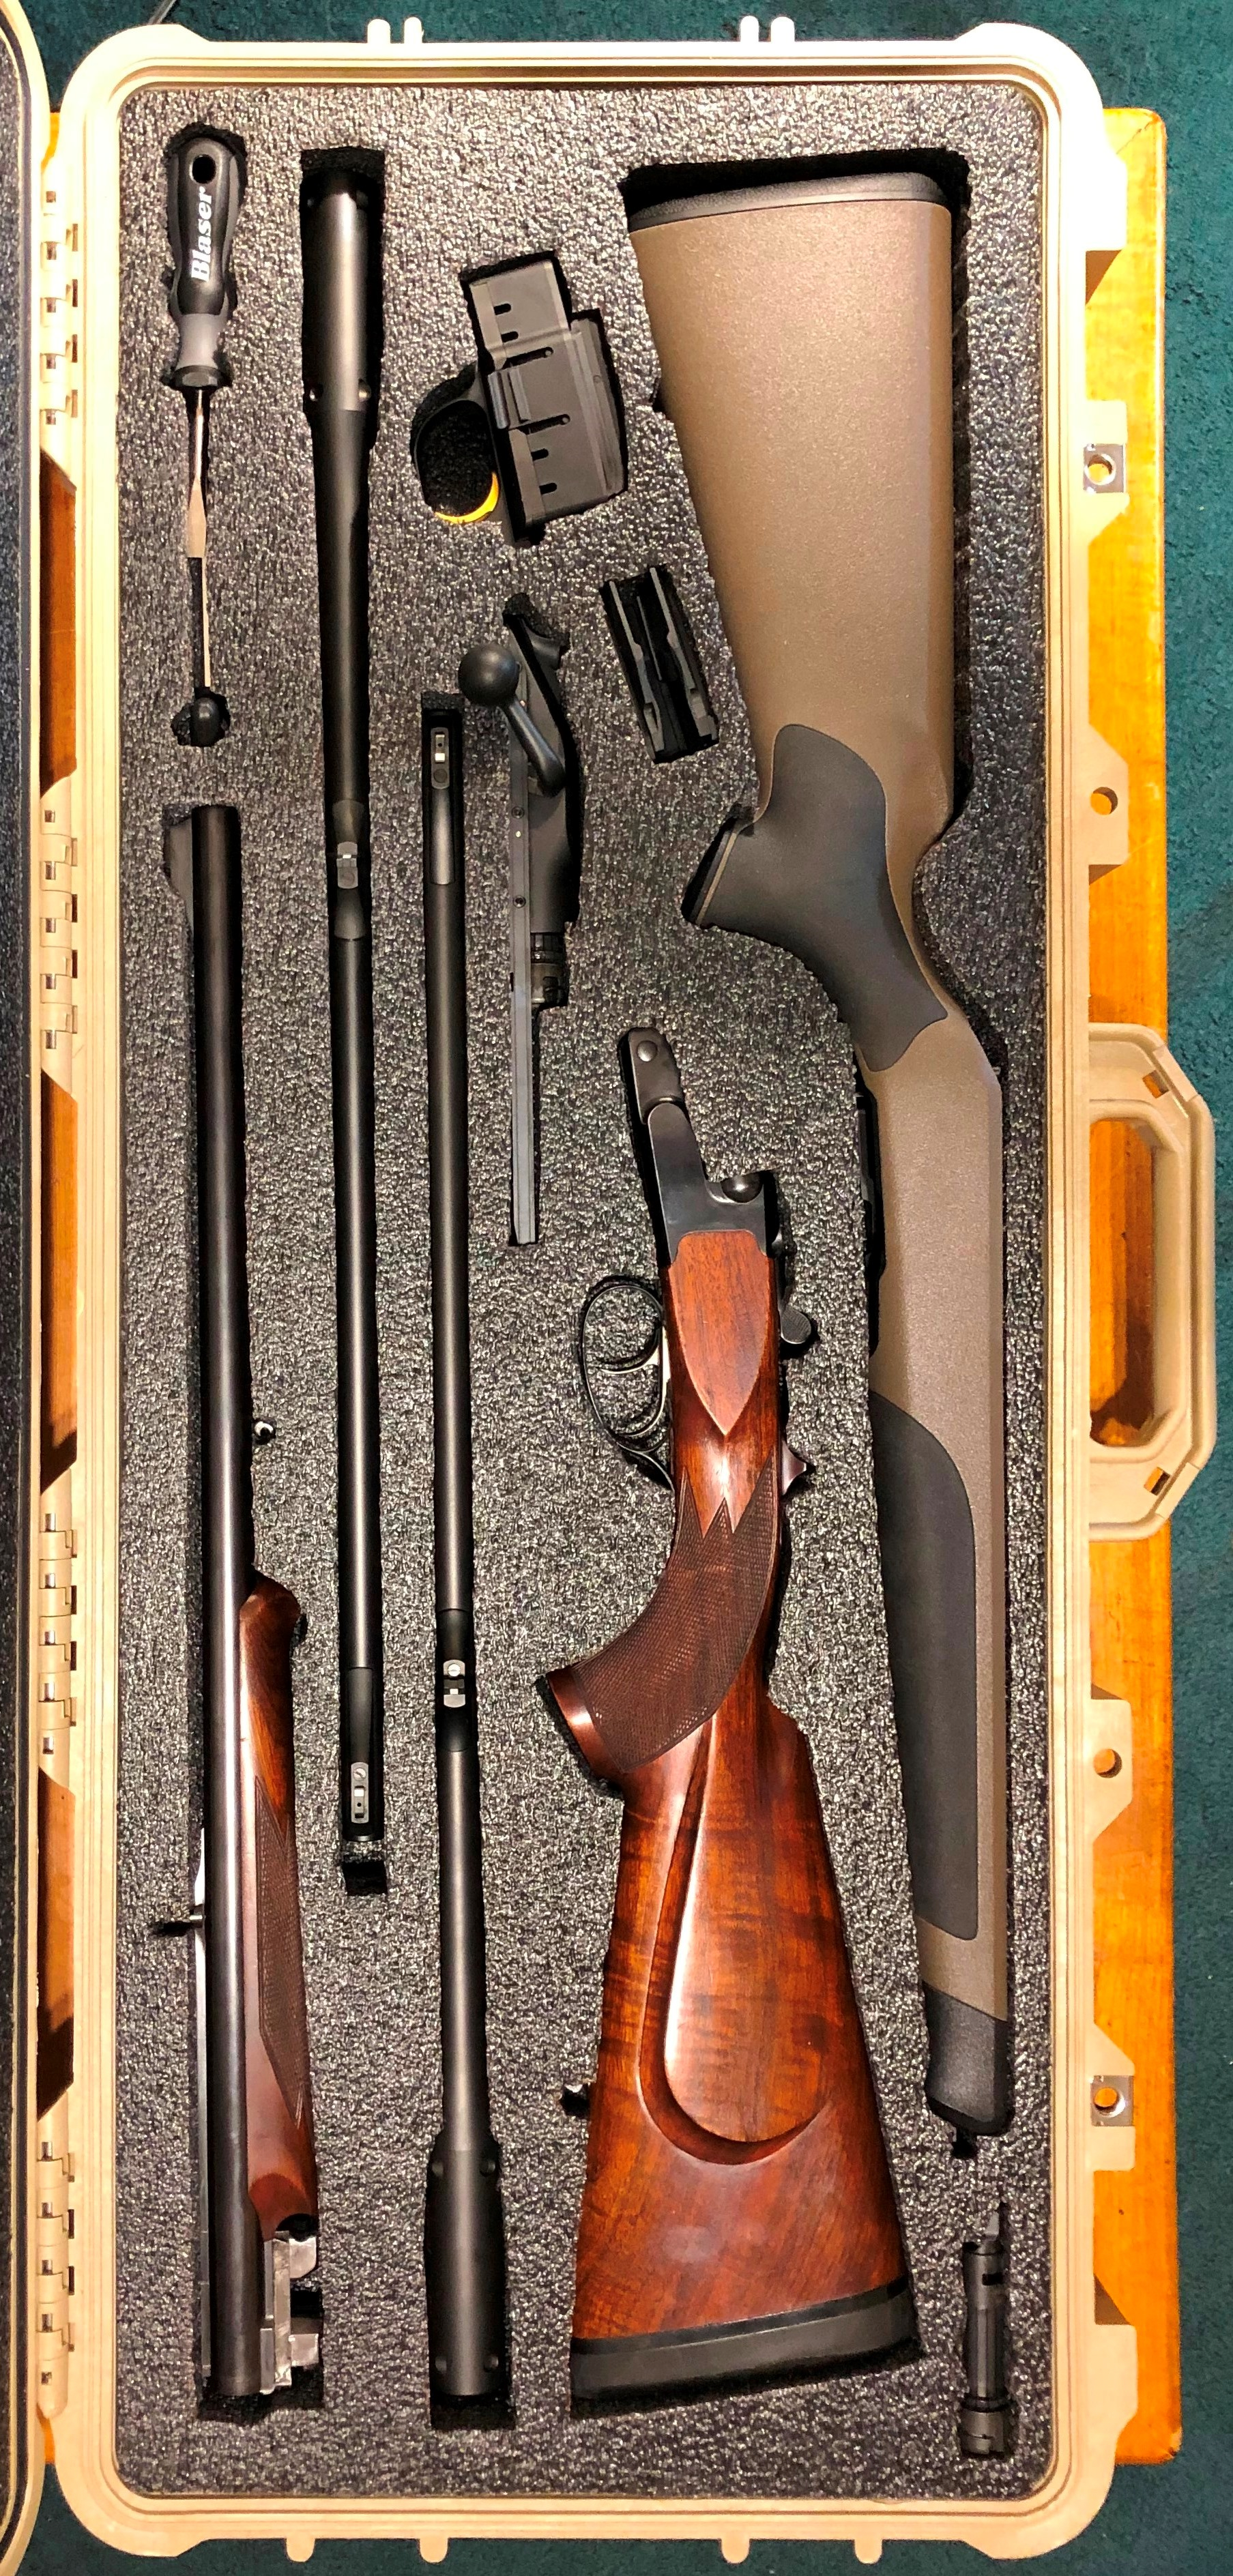 Pelican 1700 with Krieghoff .470 + Blaser R8 & 2 barrels.jpg